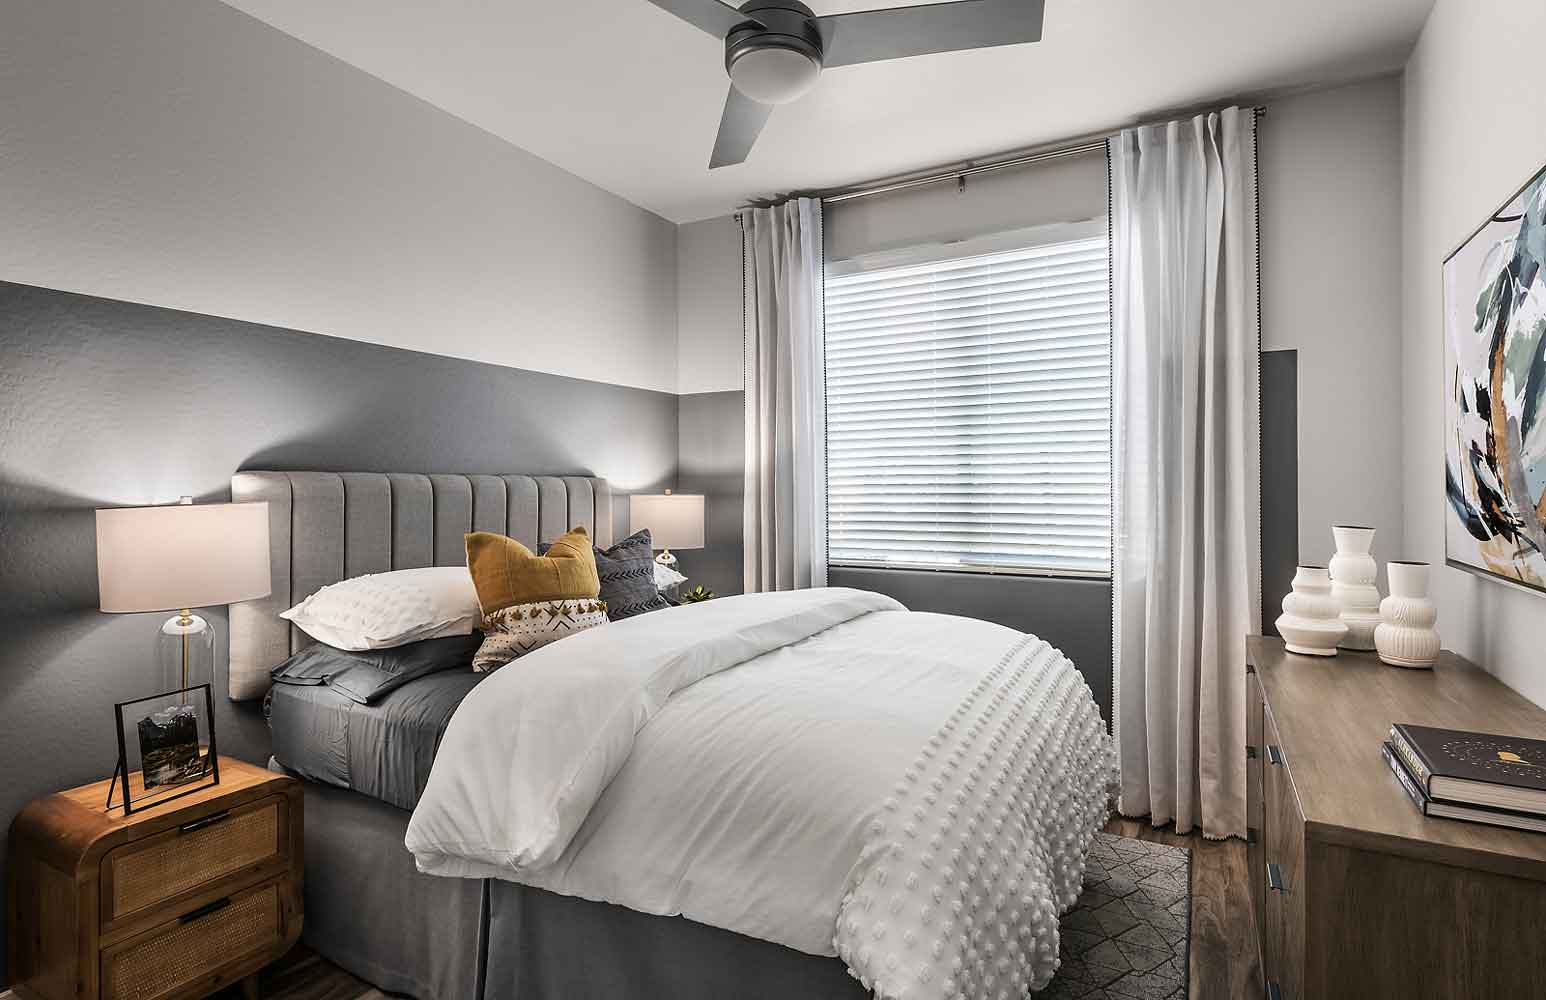 Two Bedroom at Village at Harvard Crossing Apartments in Goodyear, AZ